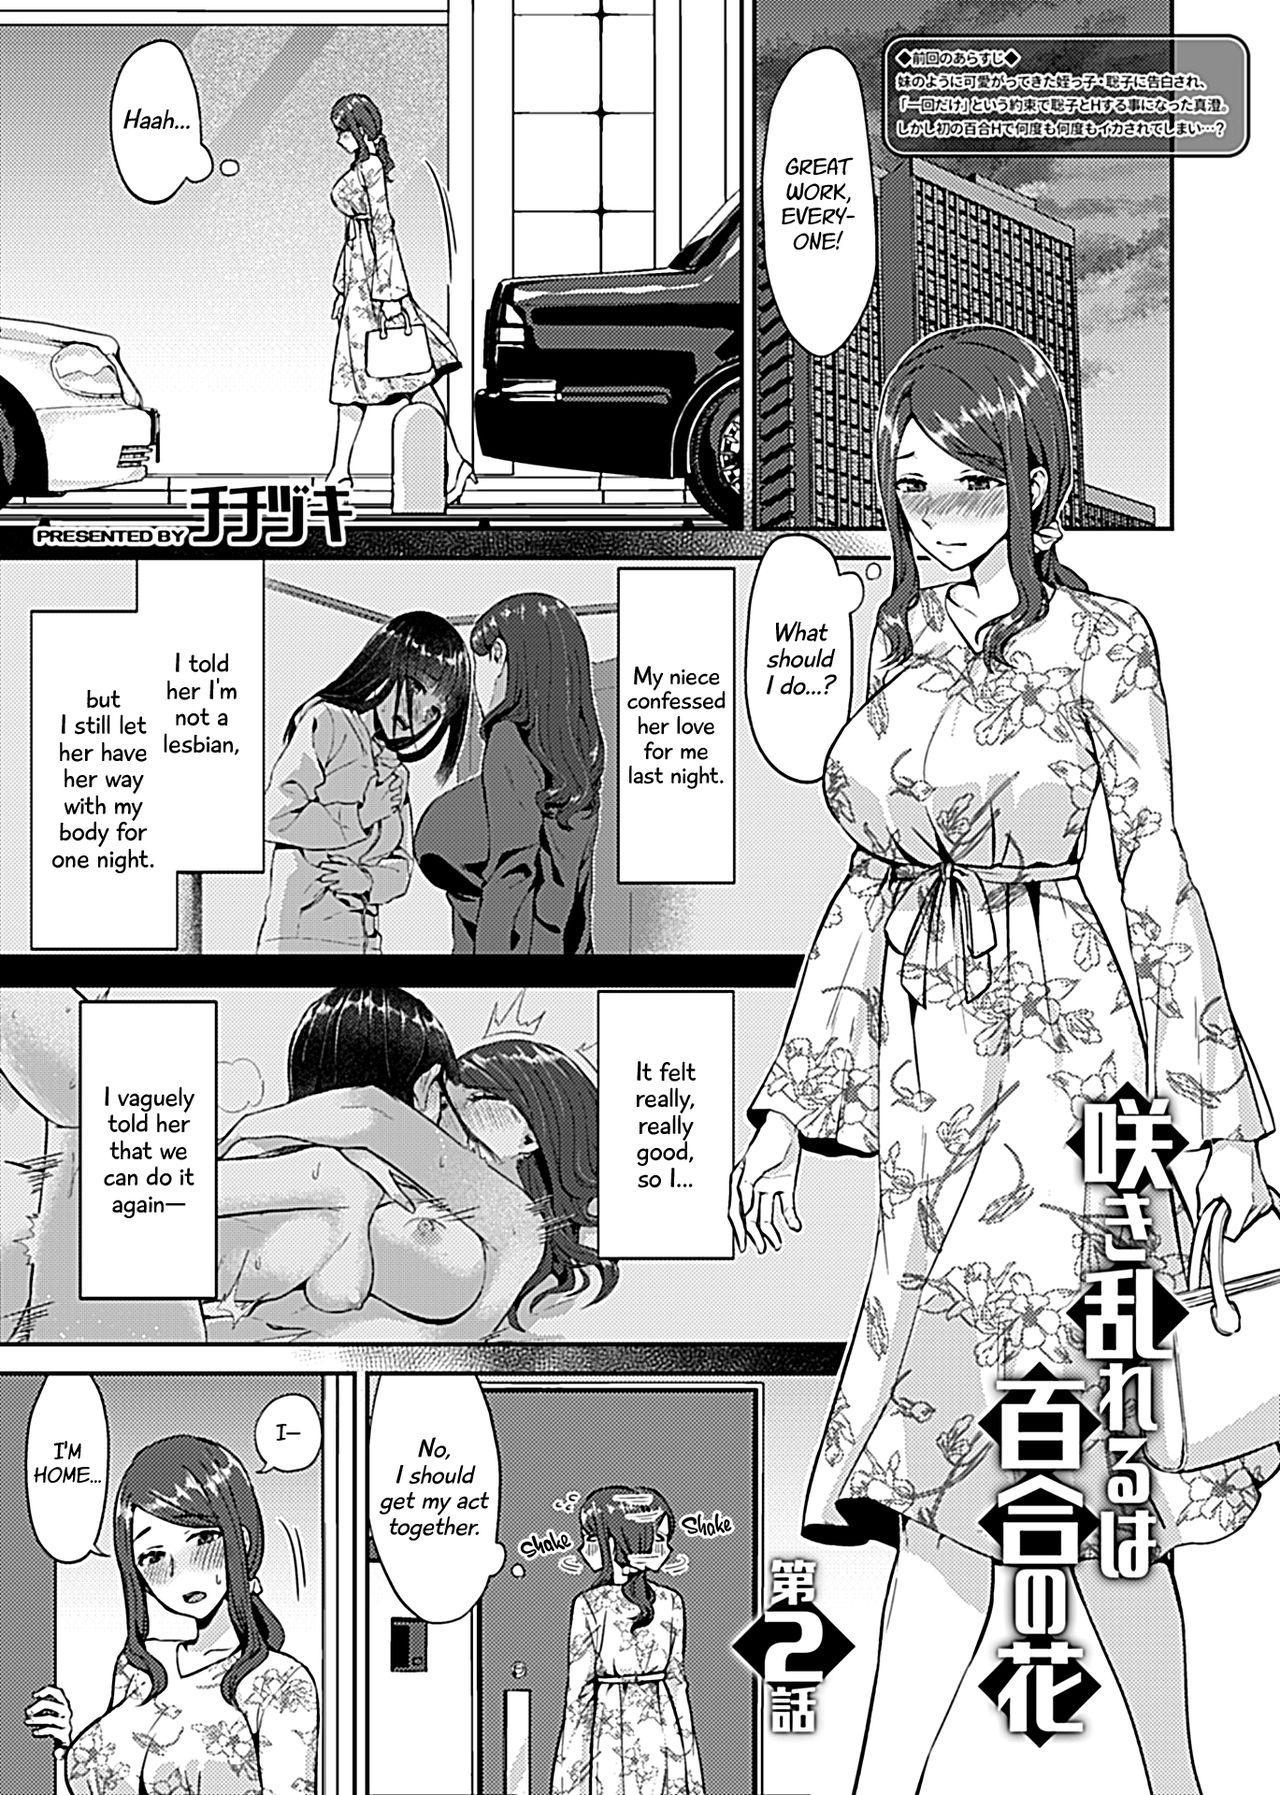 Saki Midareru wa Yuri no Hana   The Lily Blooms Addled Ch. 1-3 22